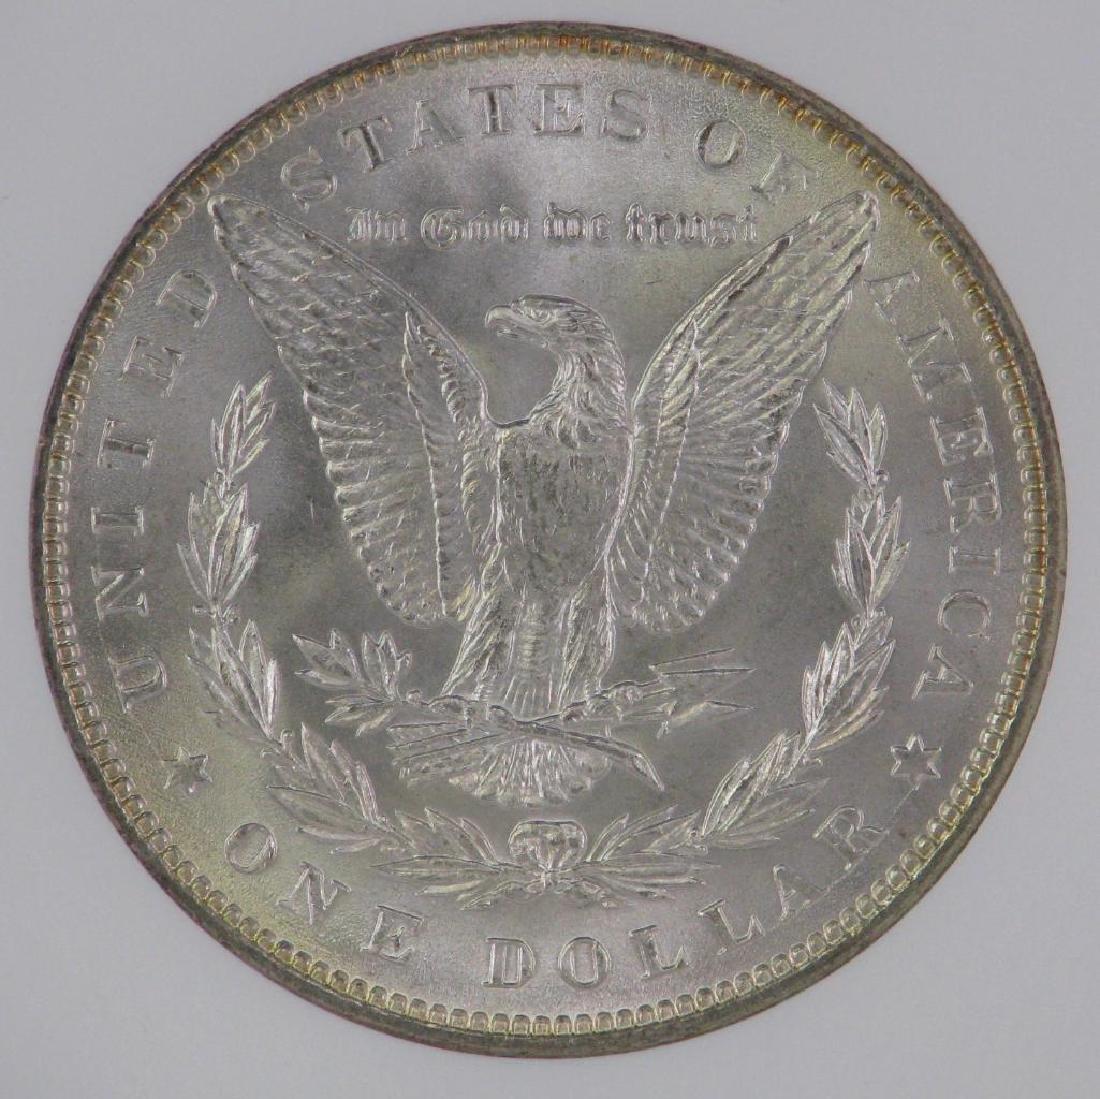 Lot of 2 : Morgan Dollars (1887-P; 1889-P) - 9